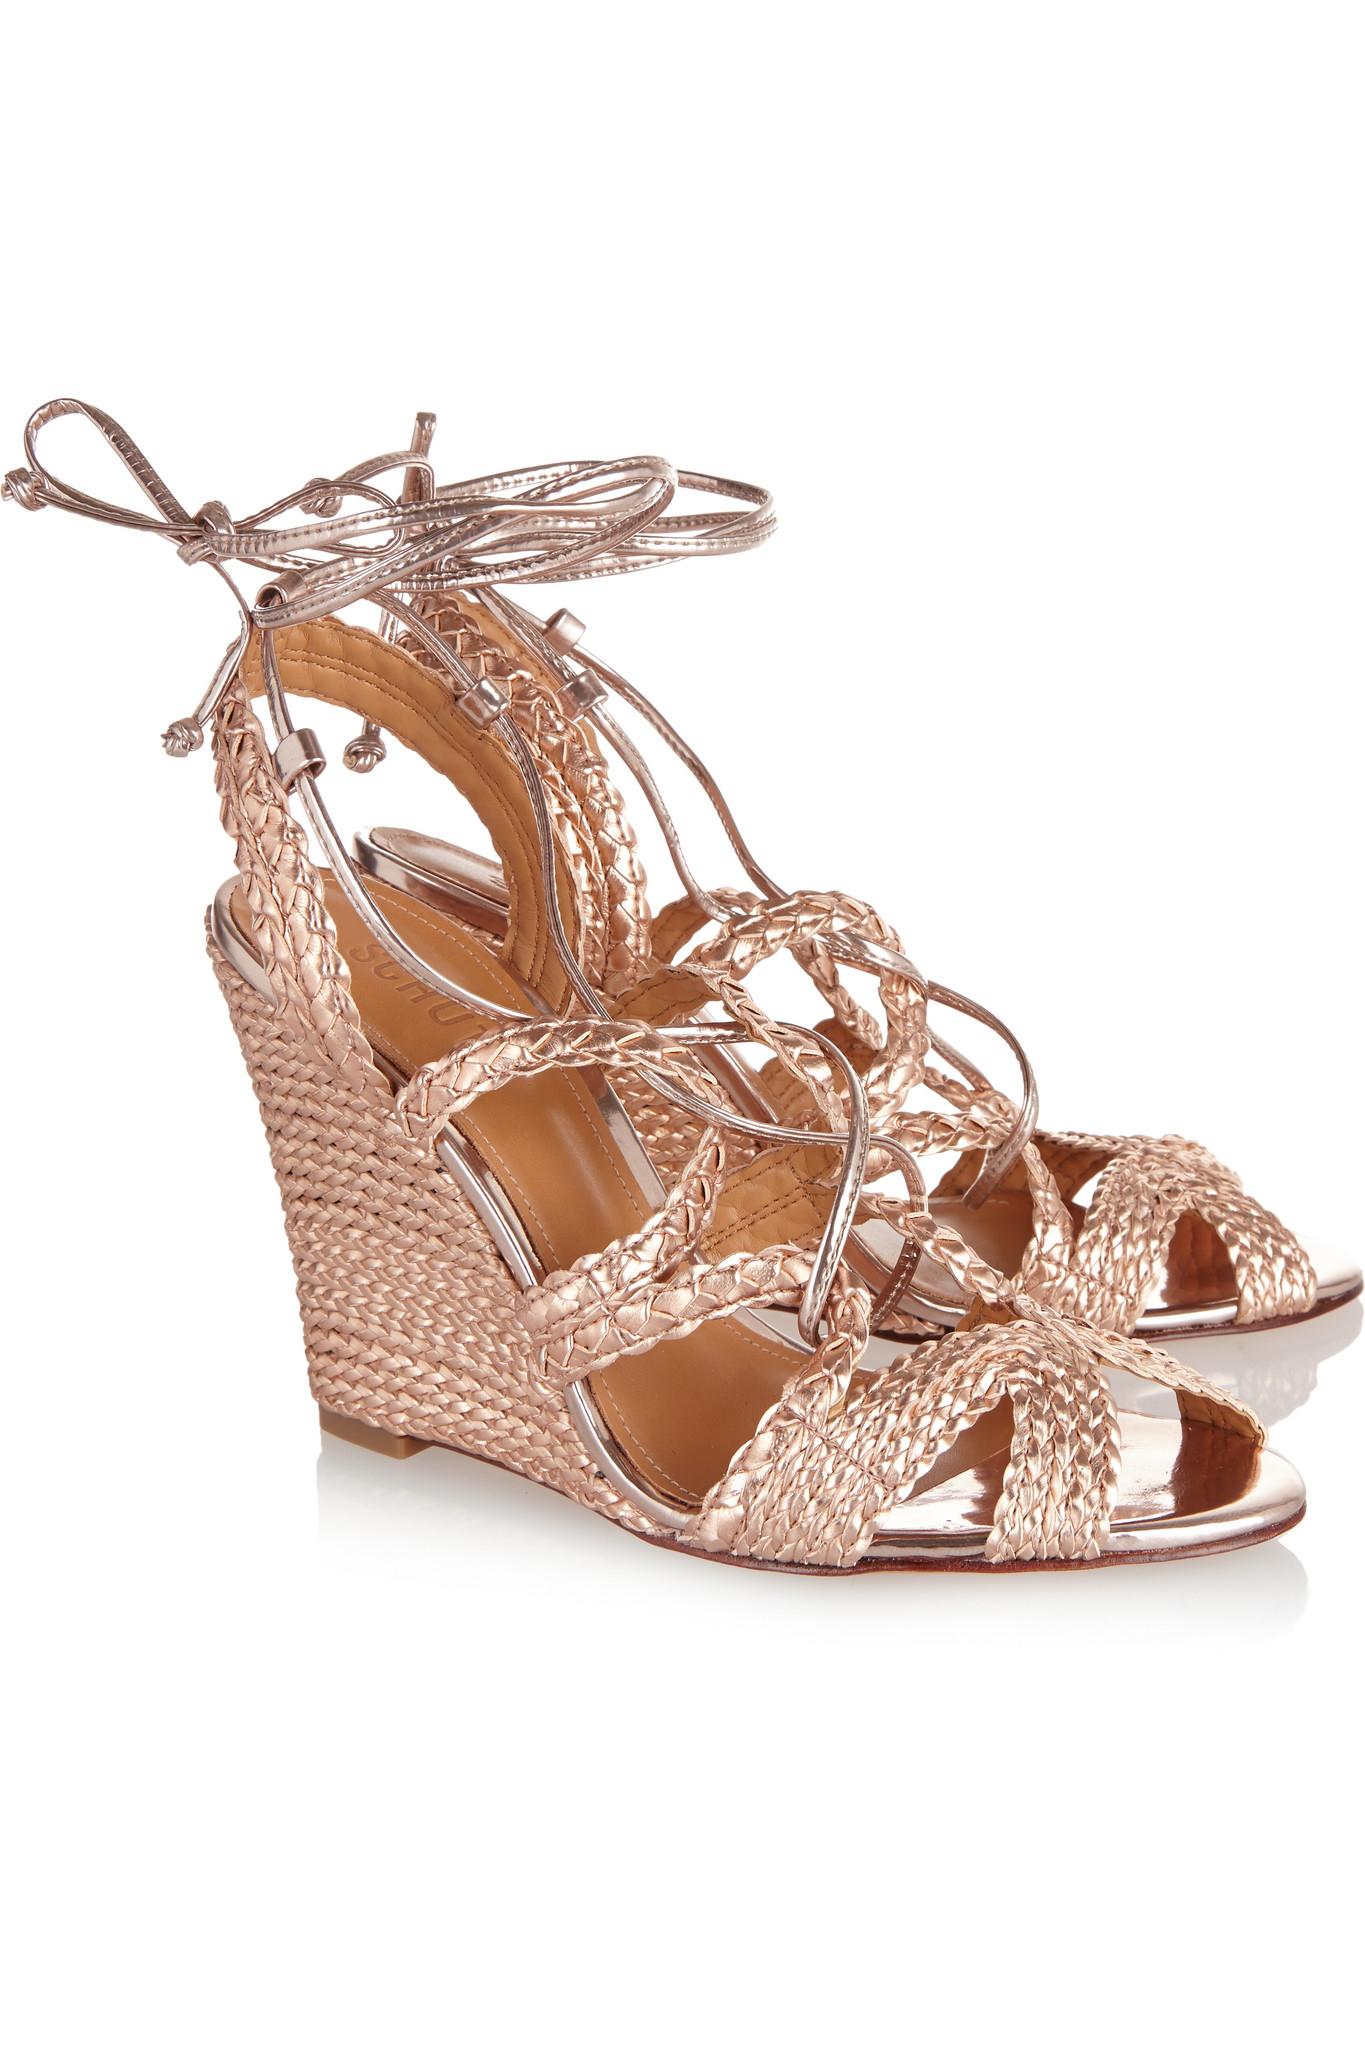 Schutz Woven Metallic Leather Wedge Sandals In Rose Gold